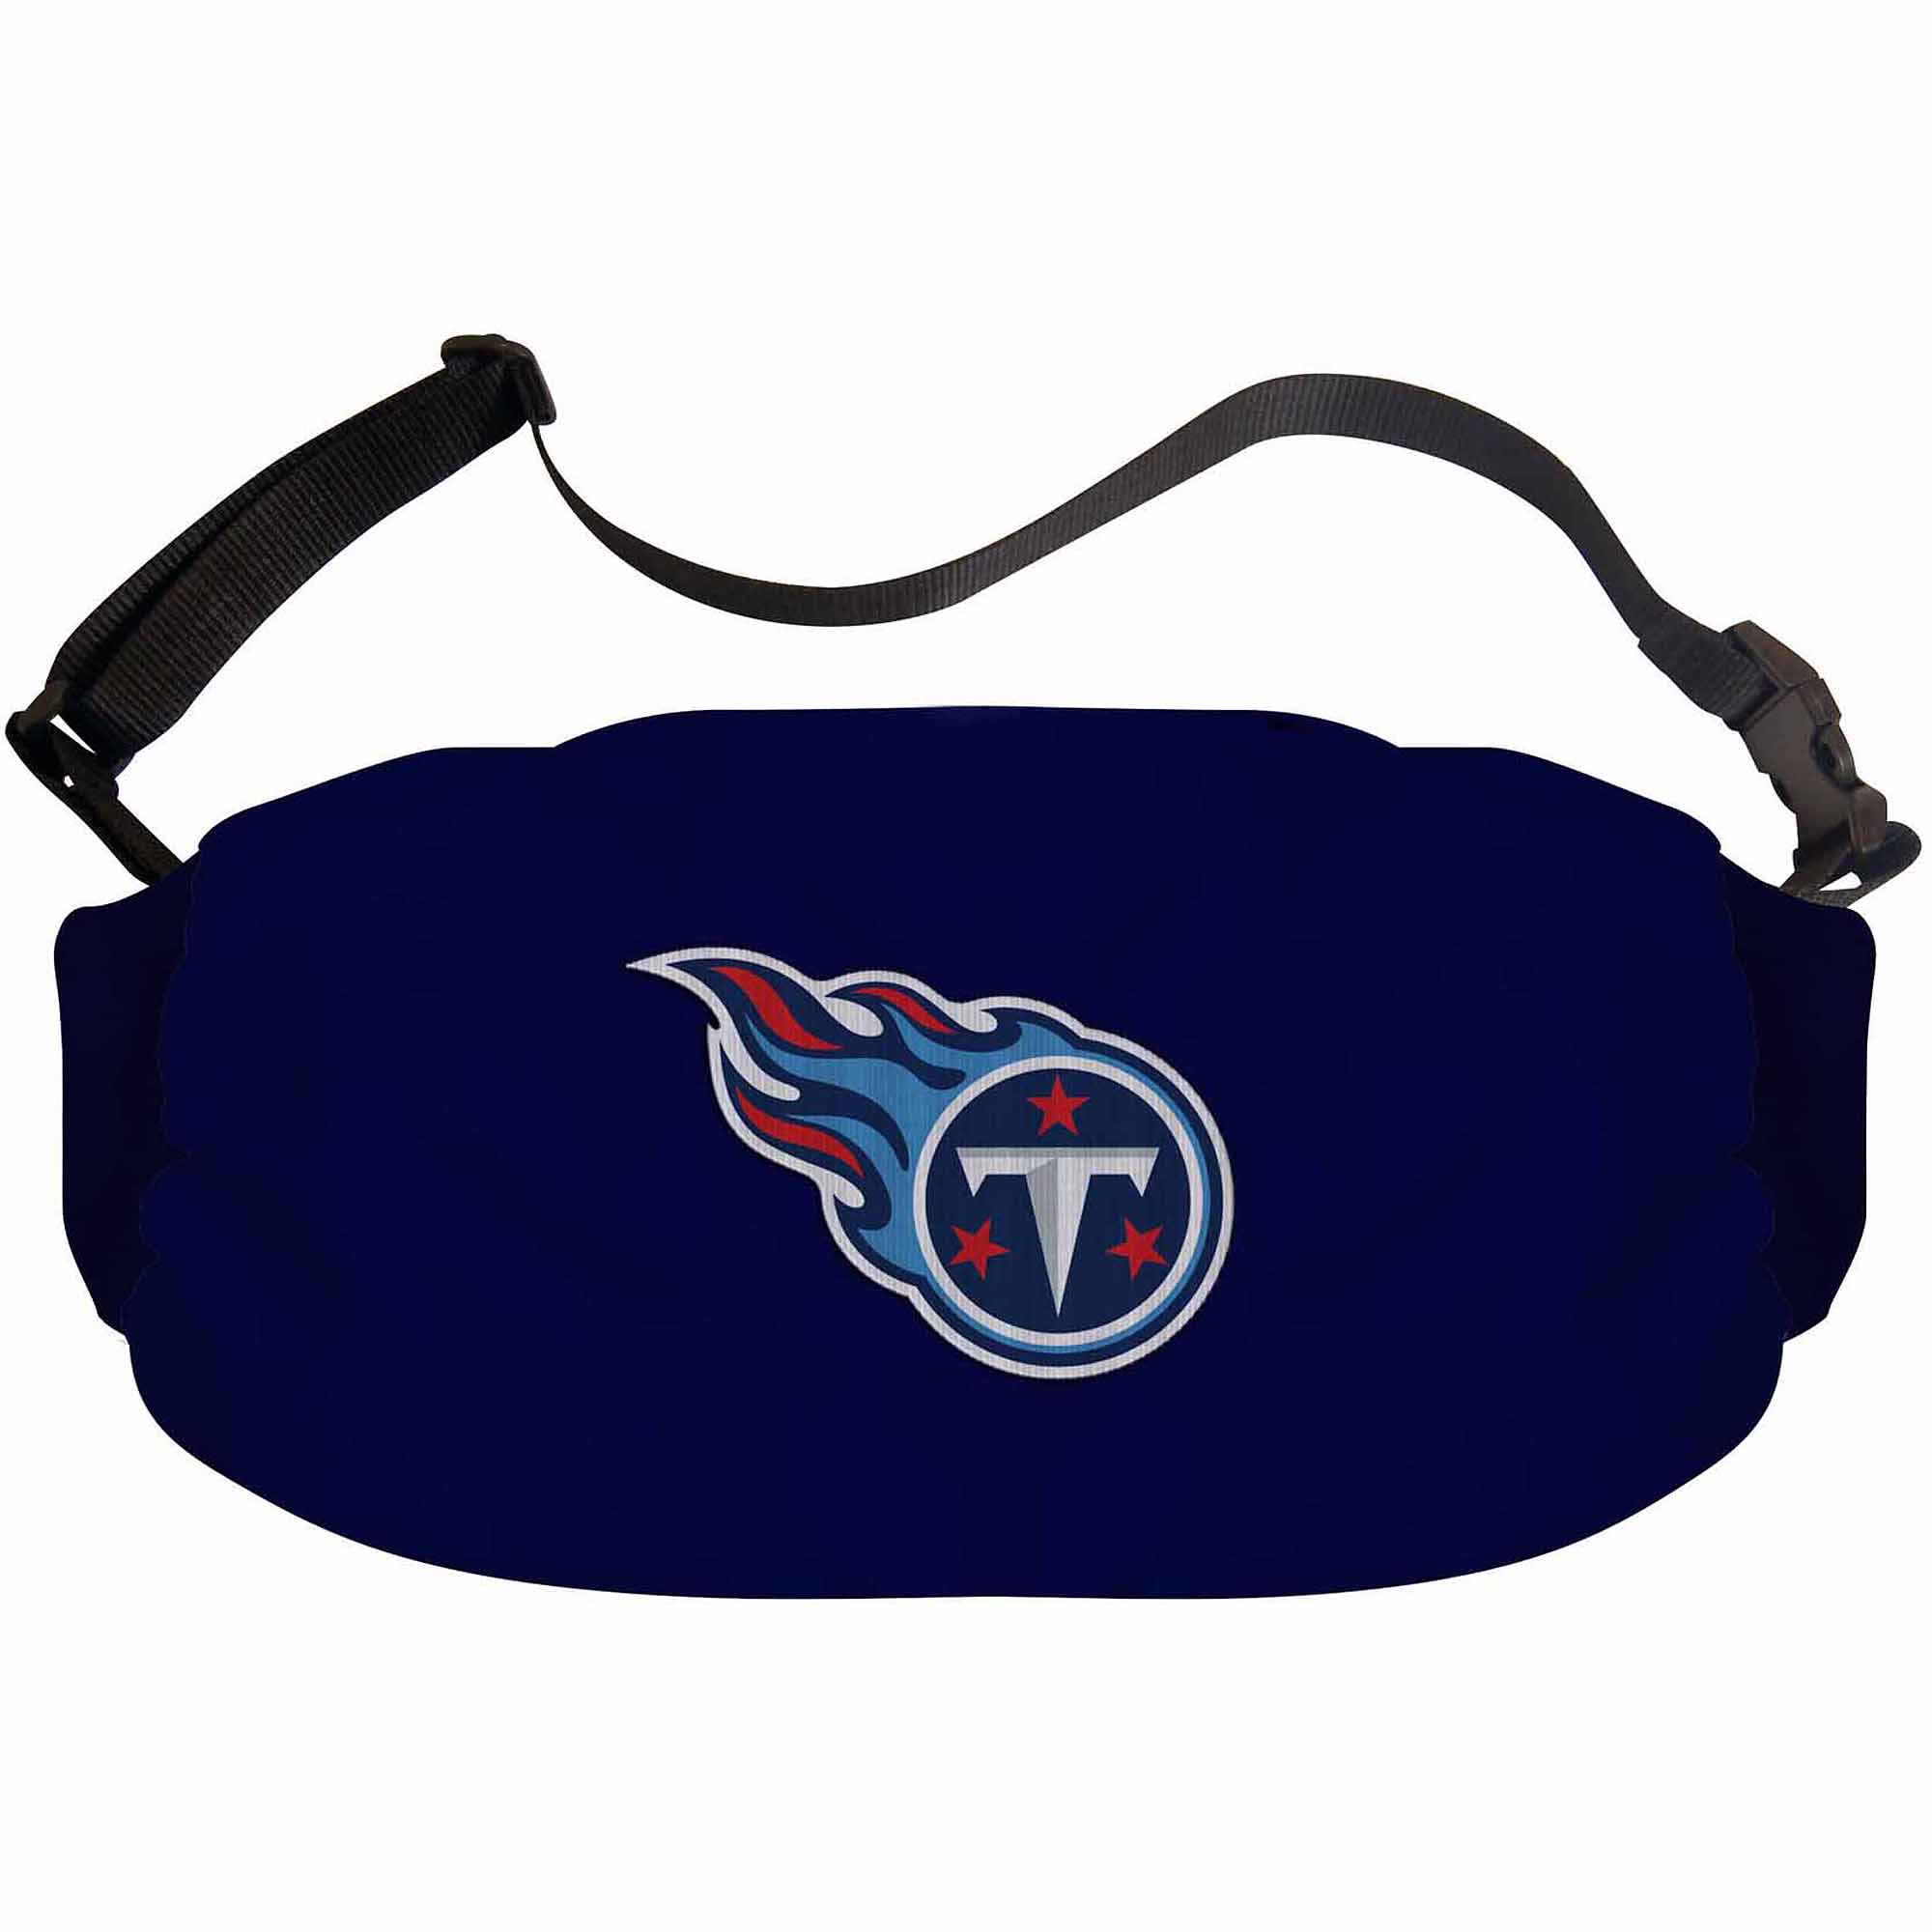 NFL Handwarmer, Tennessee Titans